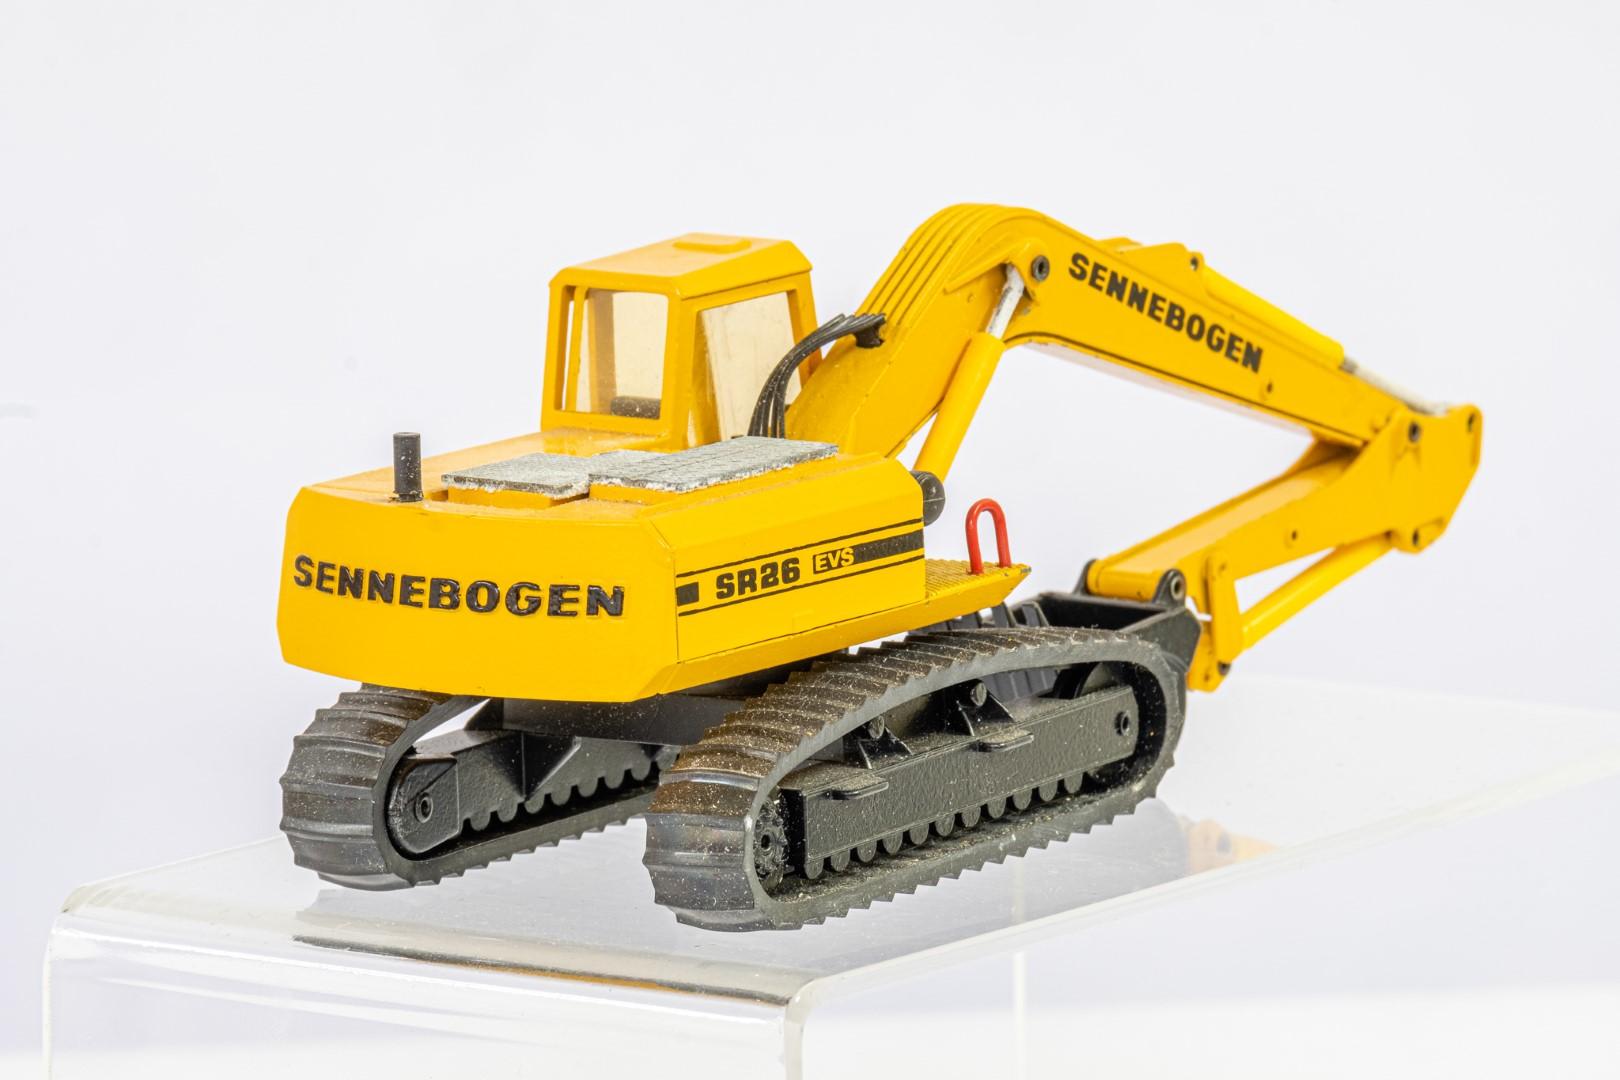 Conrad Sennebogen EVS SR26 Tracked Excavator - Rare - Image 3 of 3